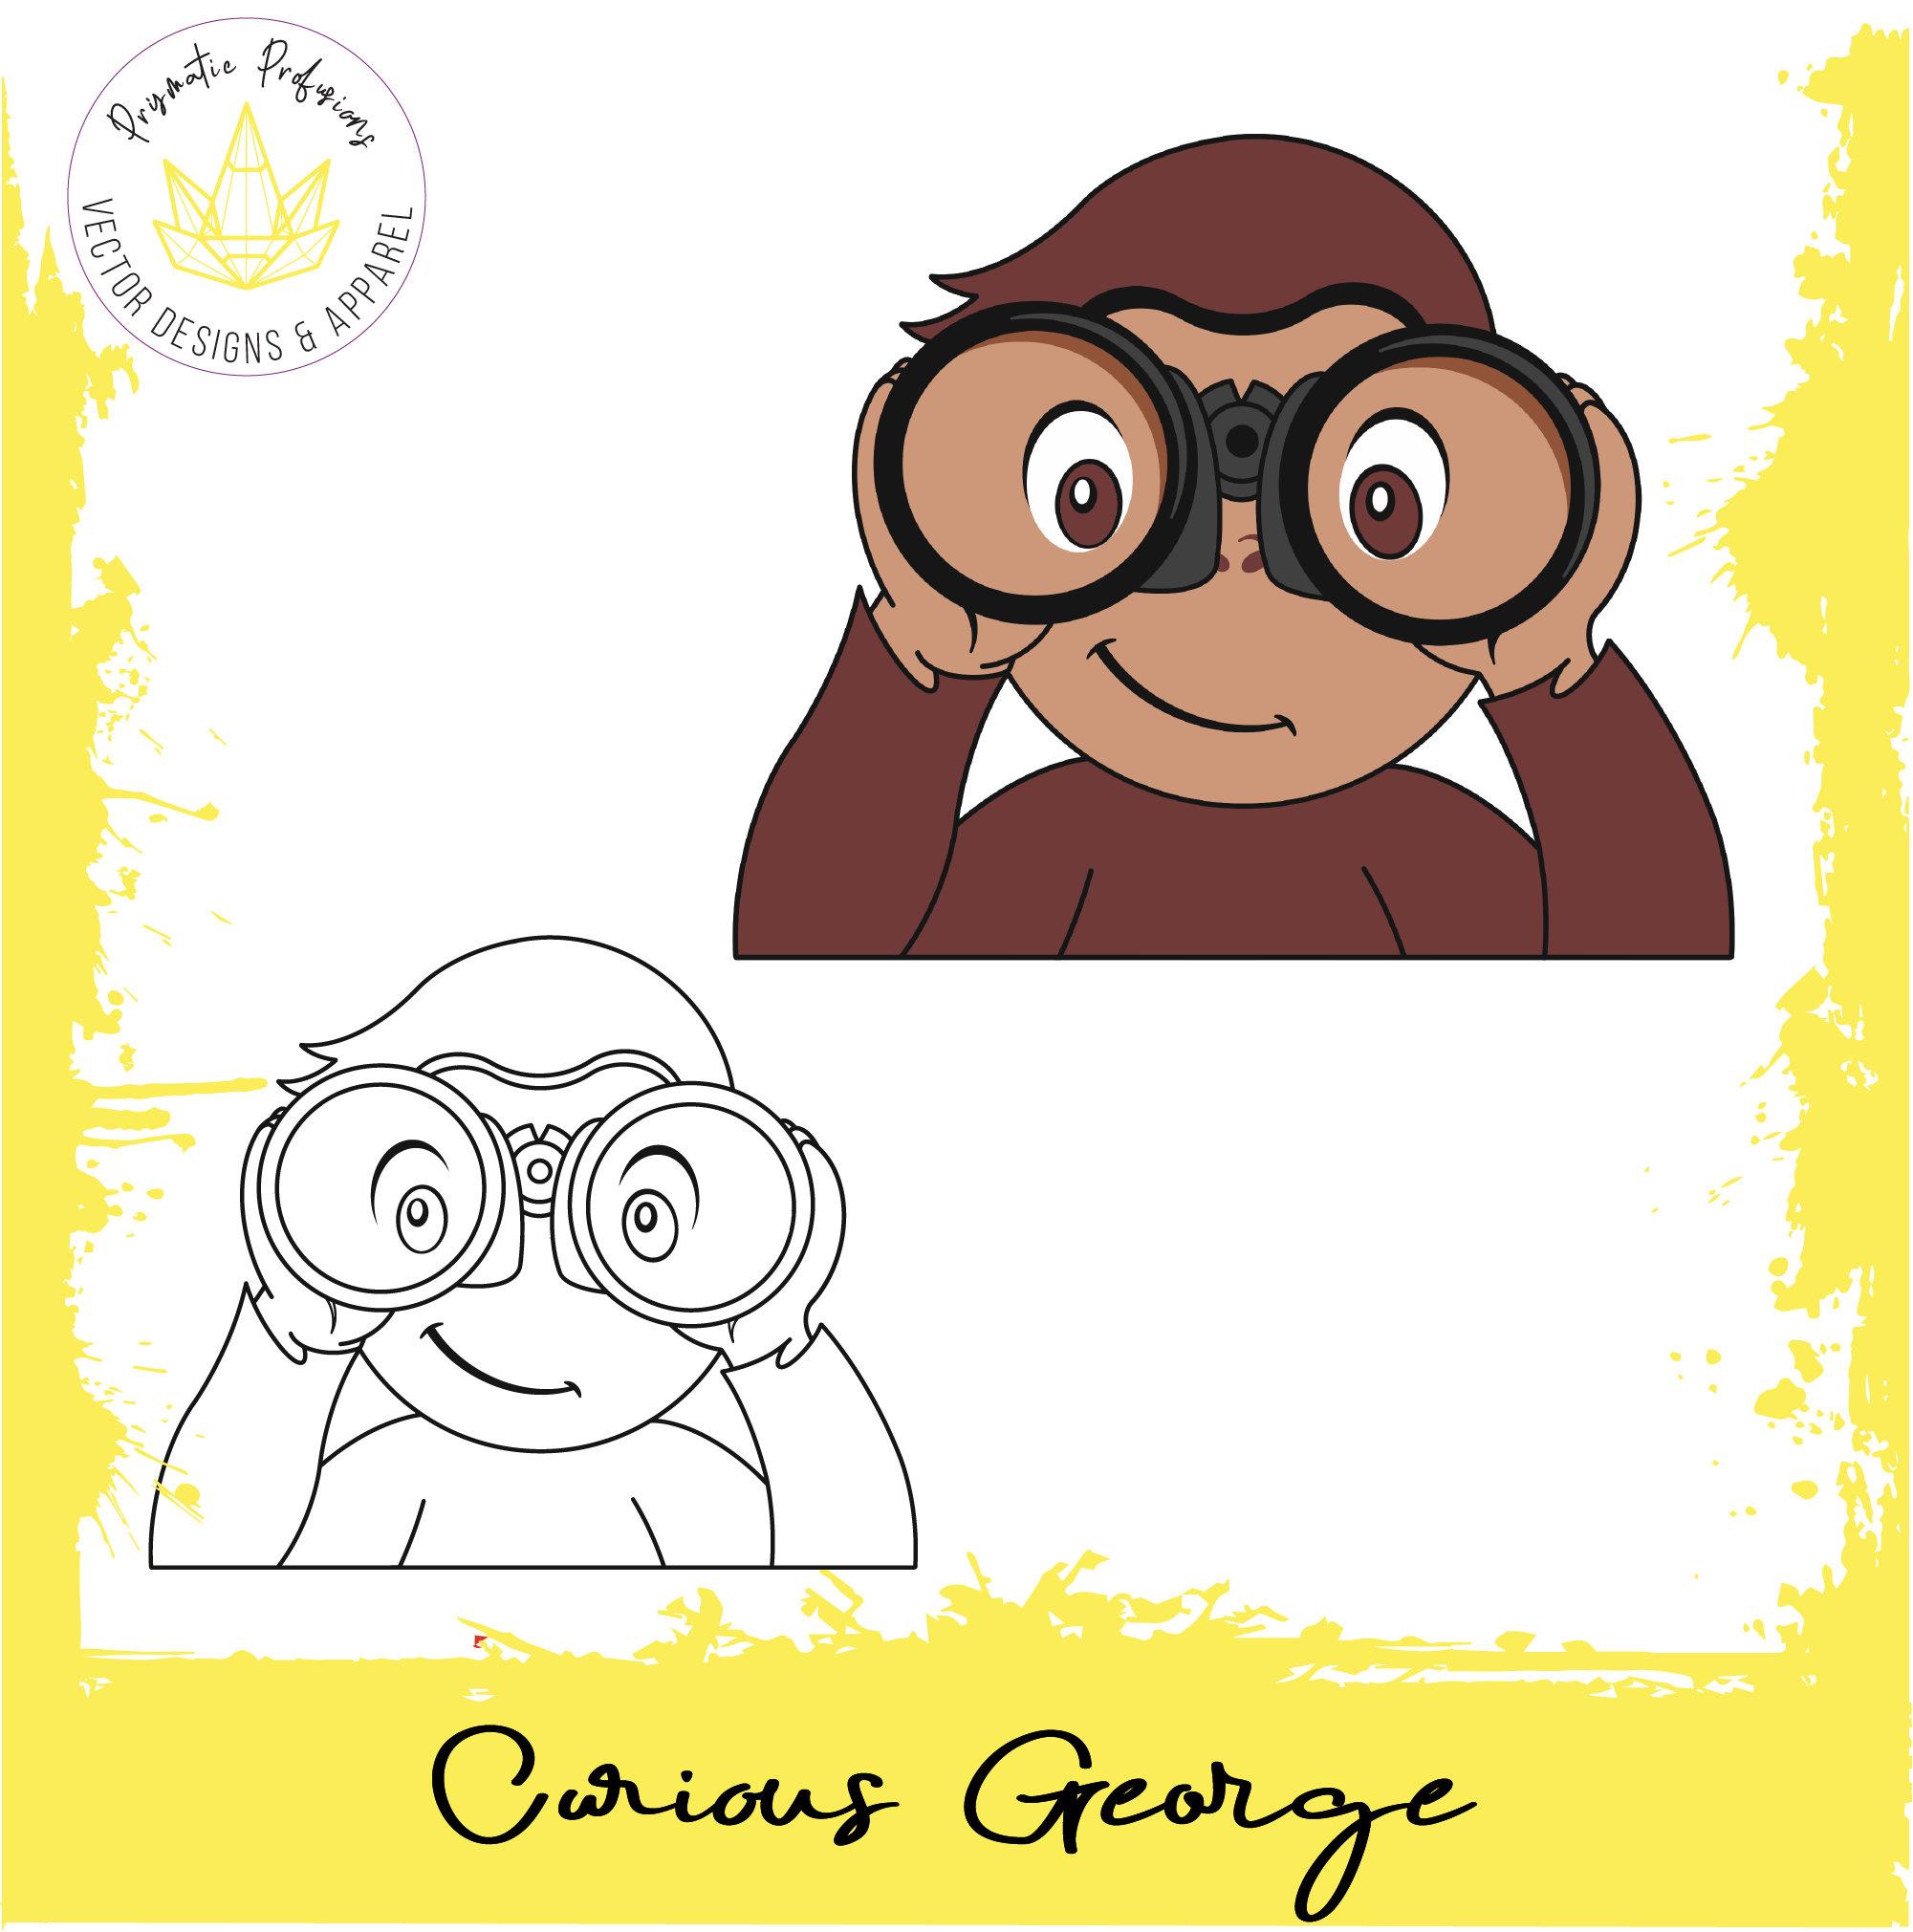 Curious George, Curious George SVG, Curious George Clipart.